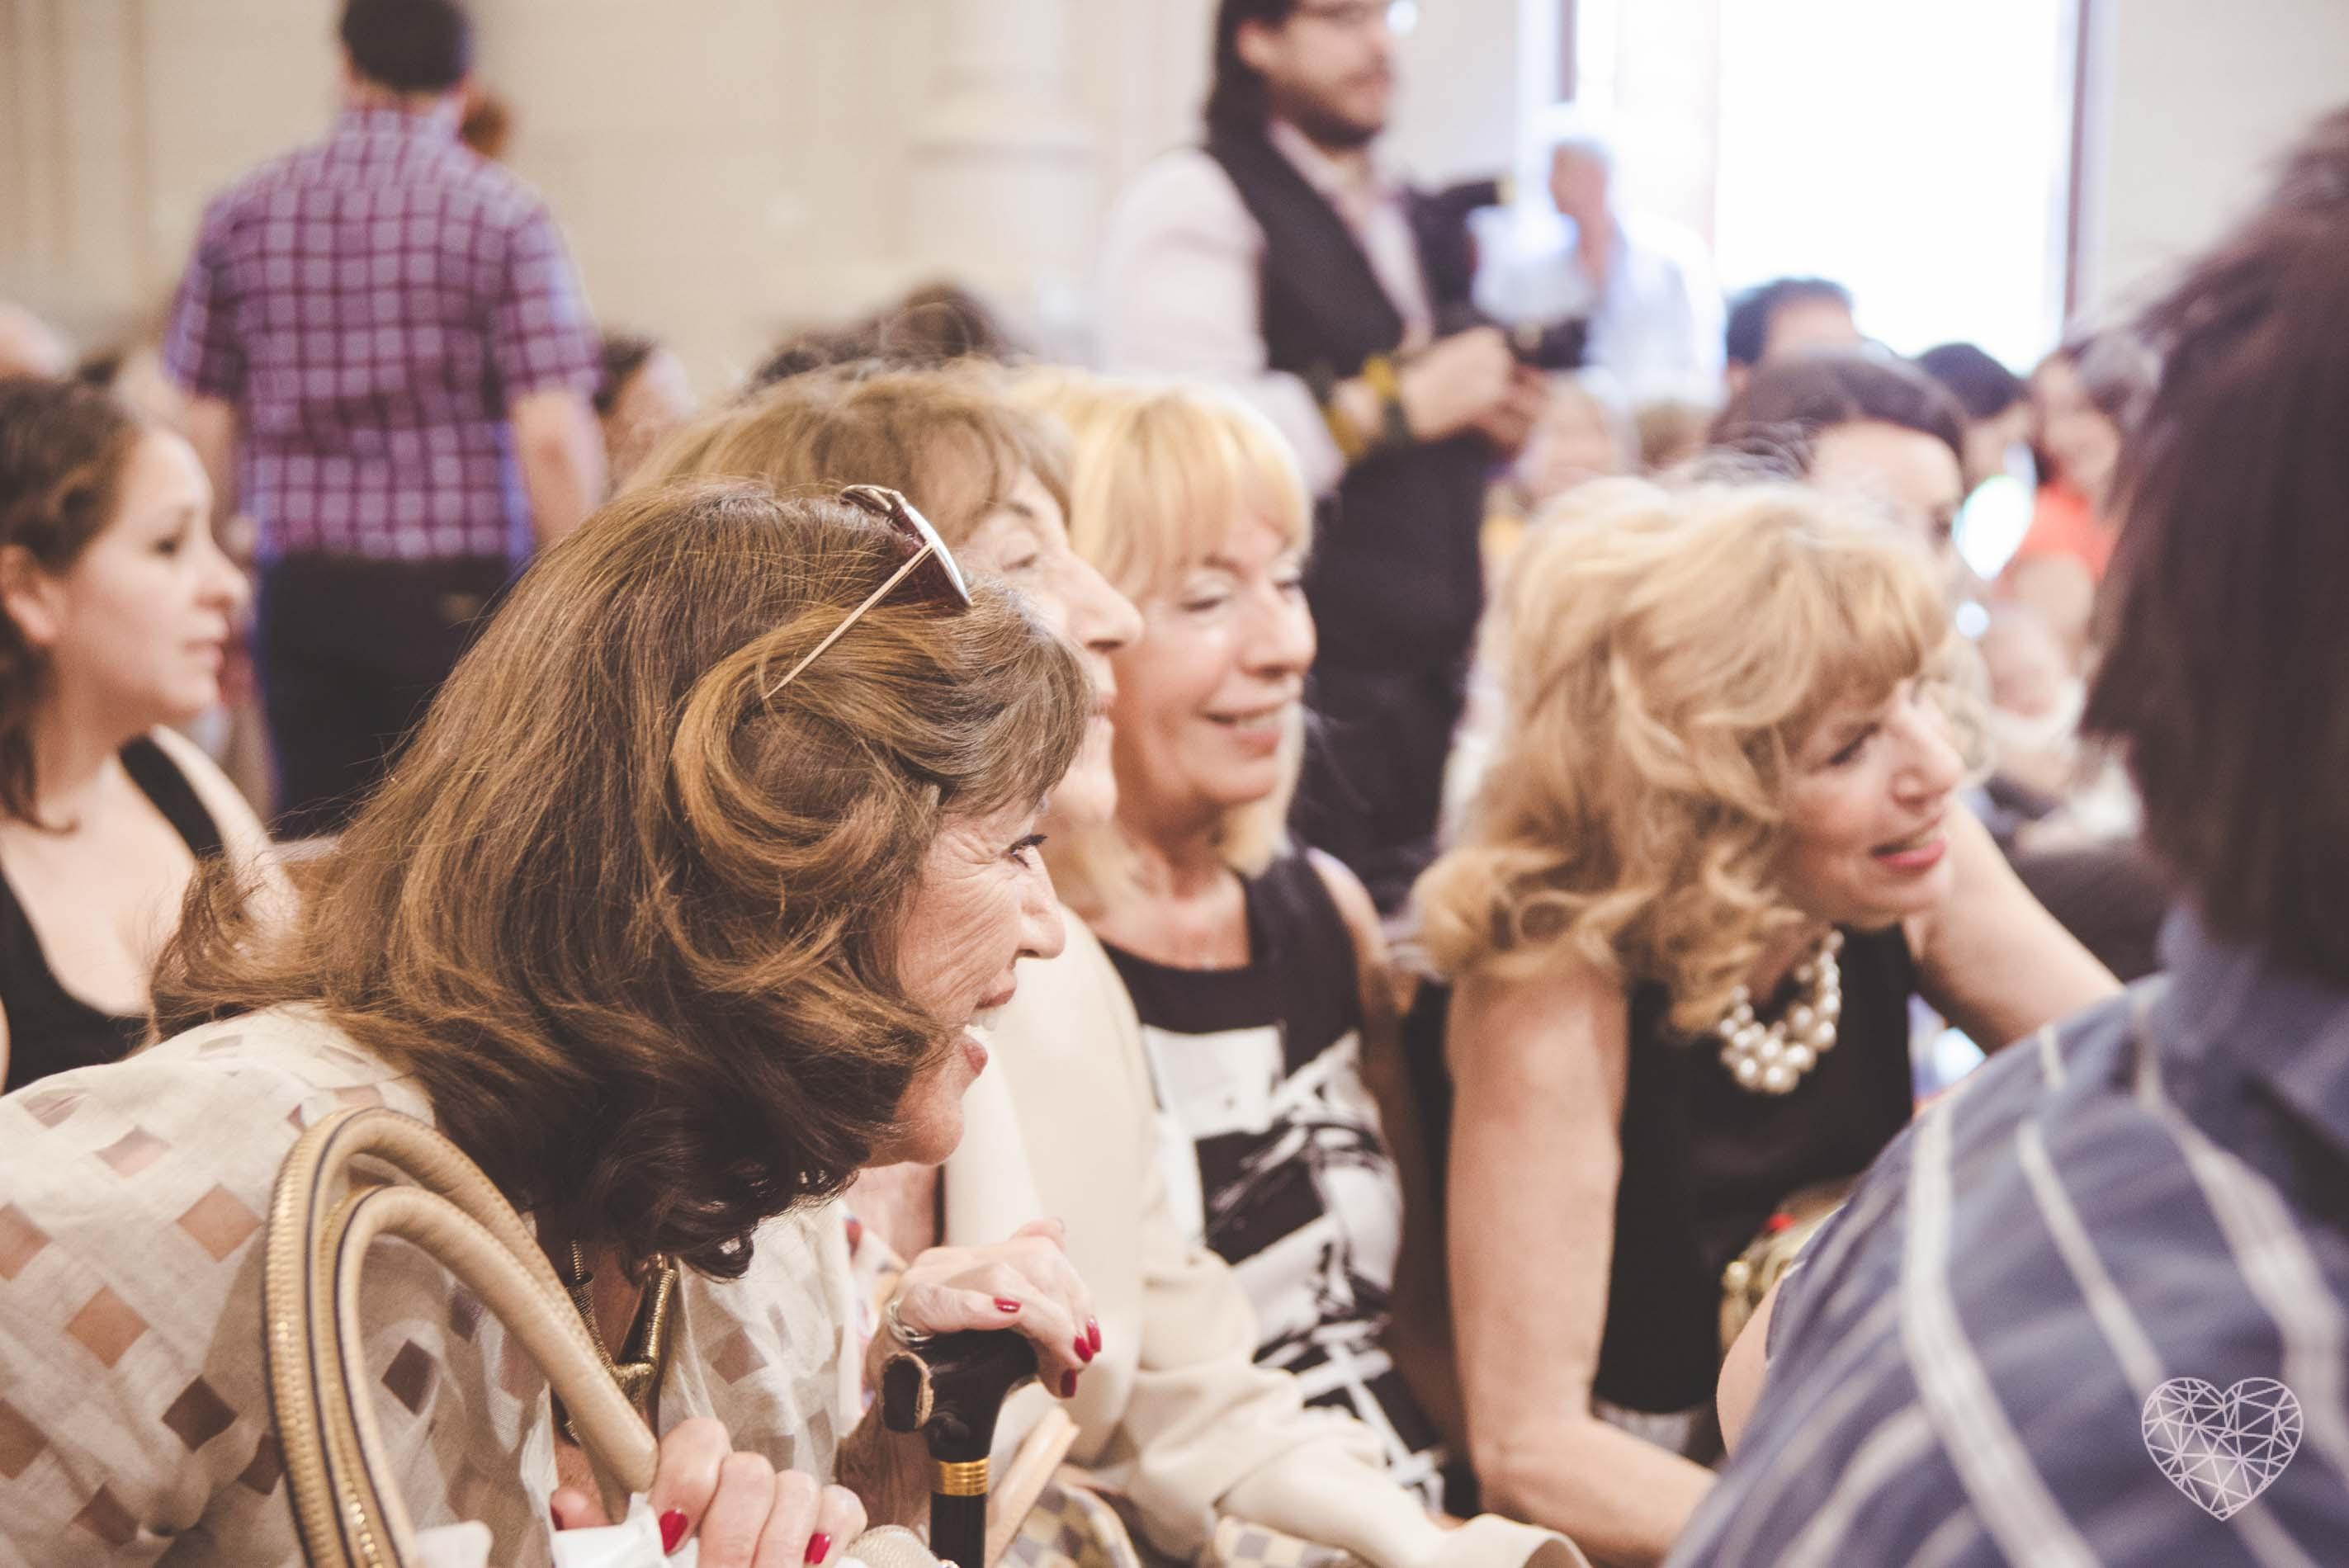 www.lovelyphoto.wedding - invitados bodas casamientos fotografo casamiento, fotografo bautismo, fotografa